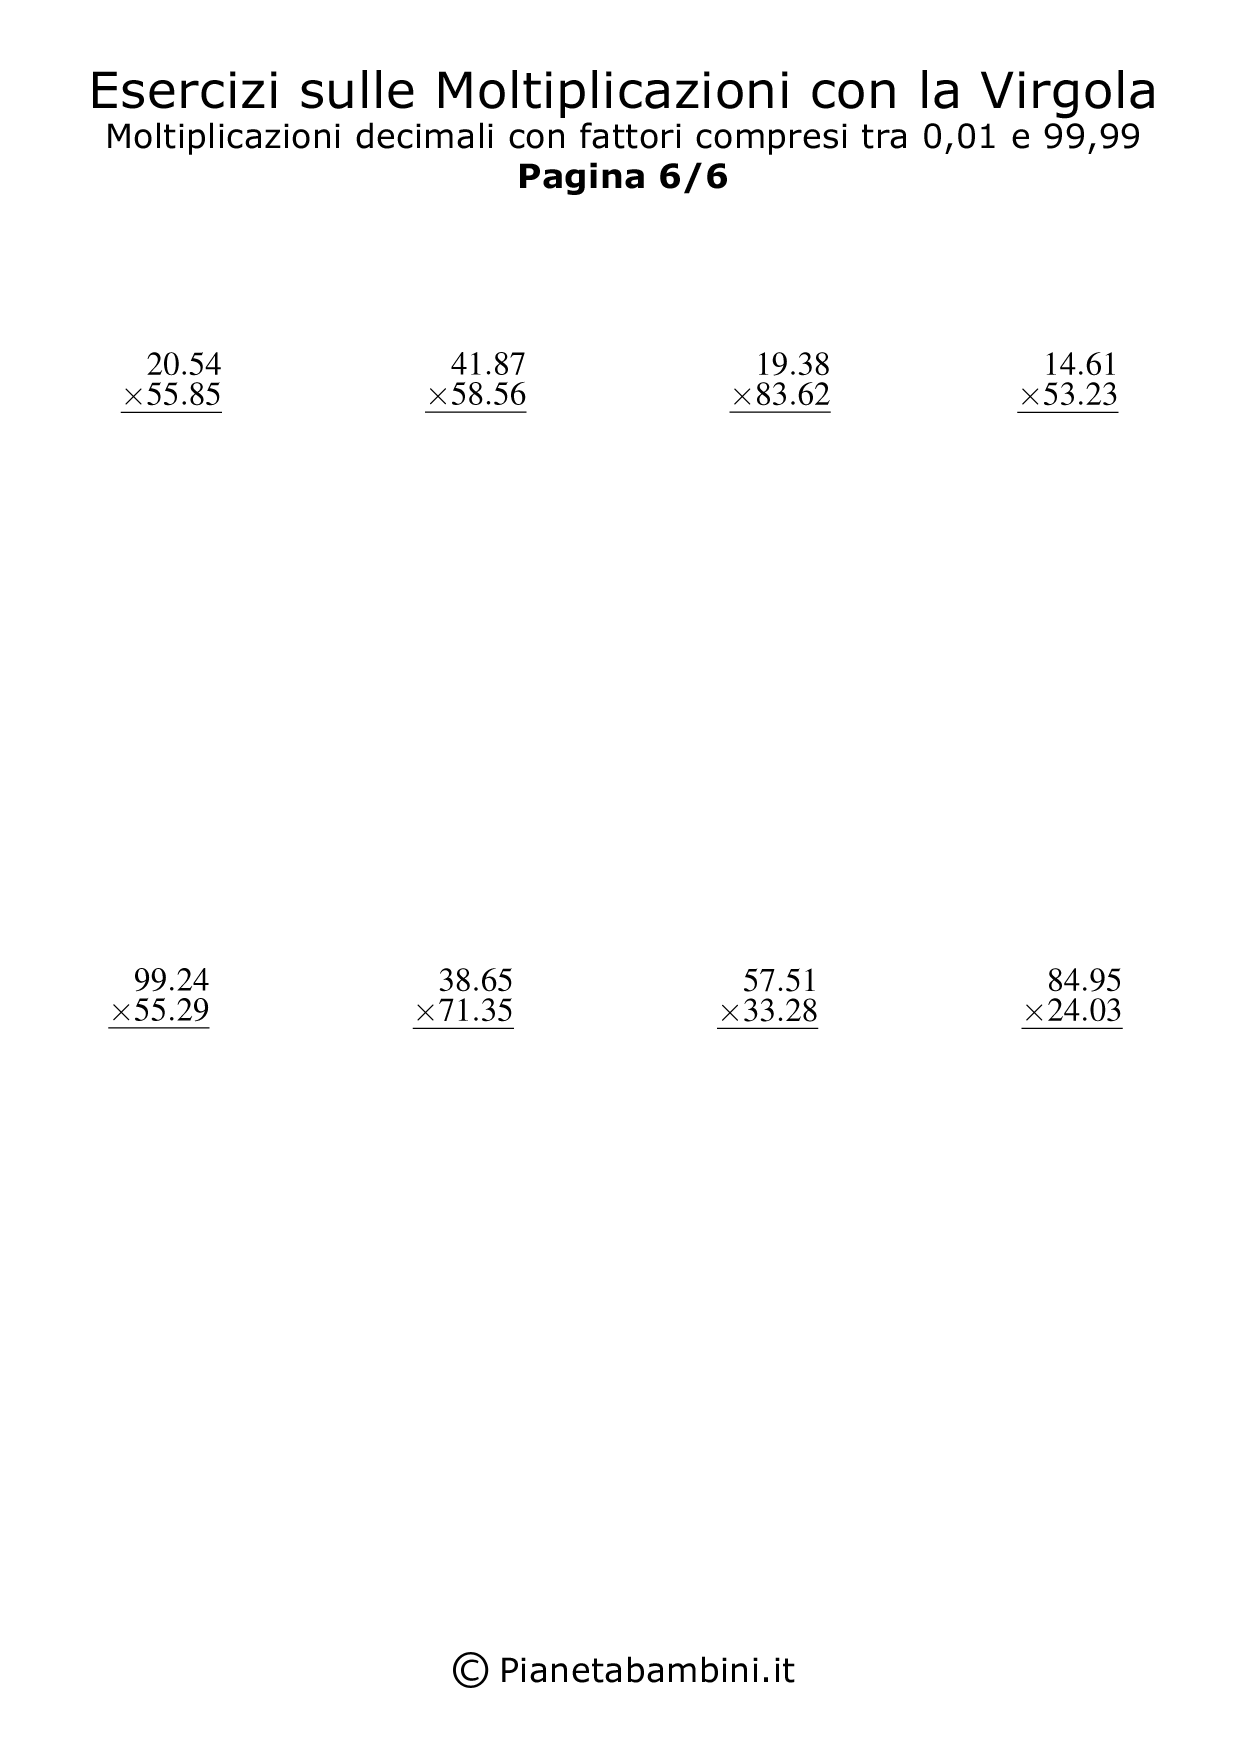 Moltiplicazioni-Virgola-0.01-99.99_6